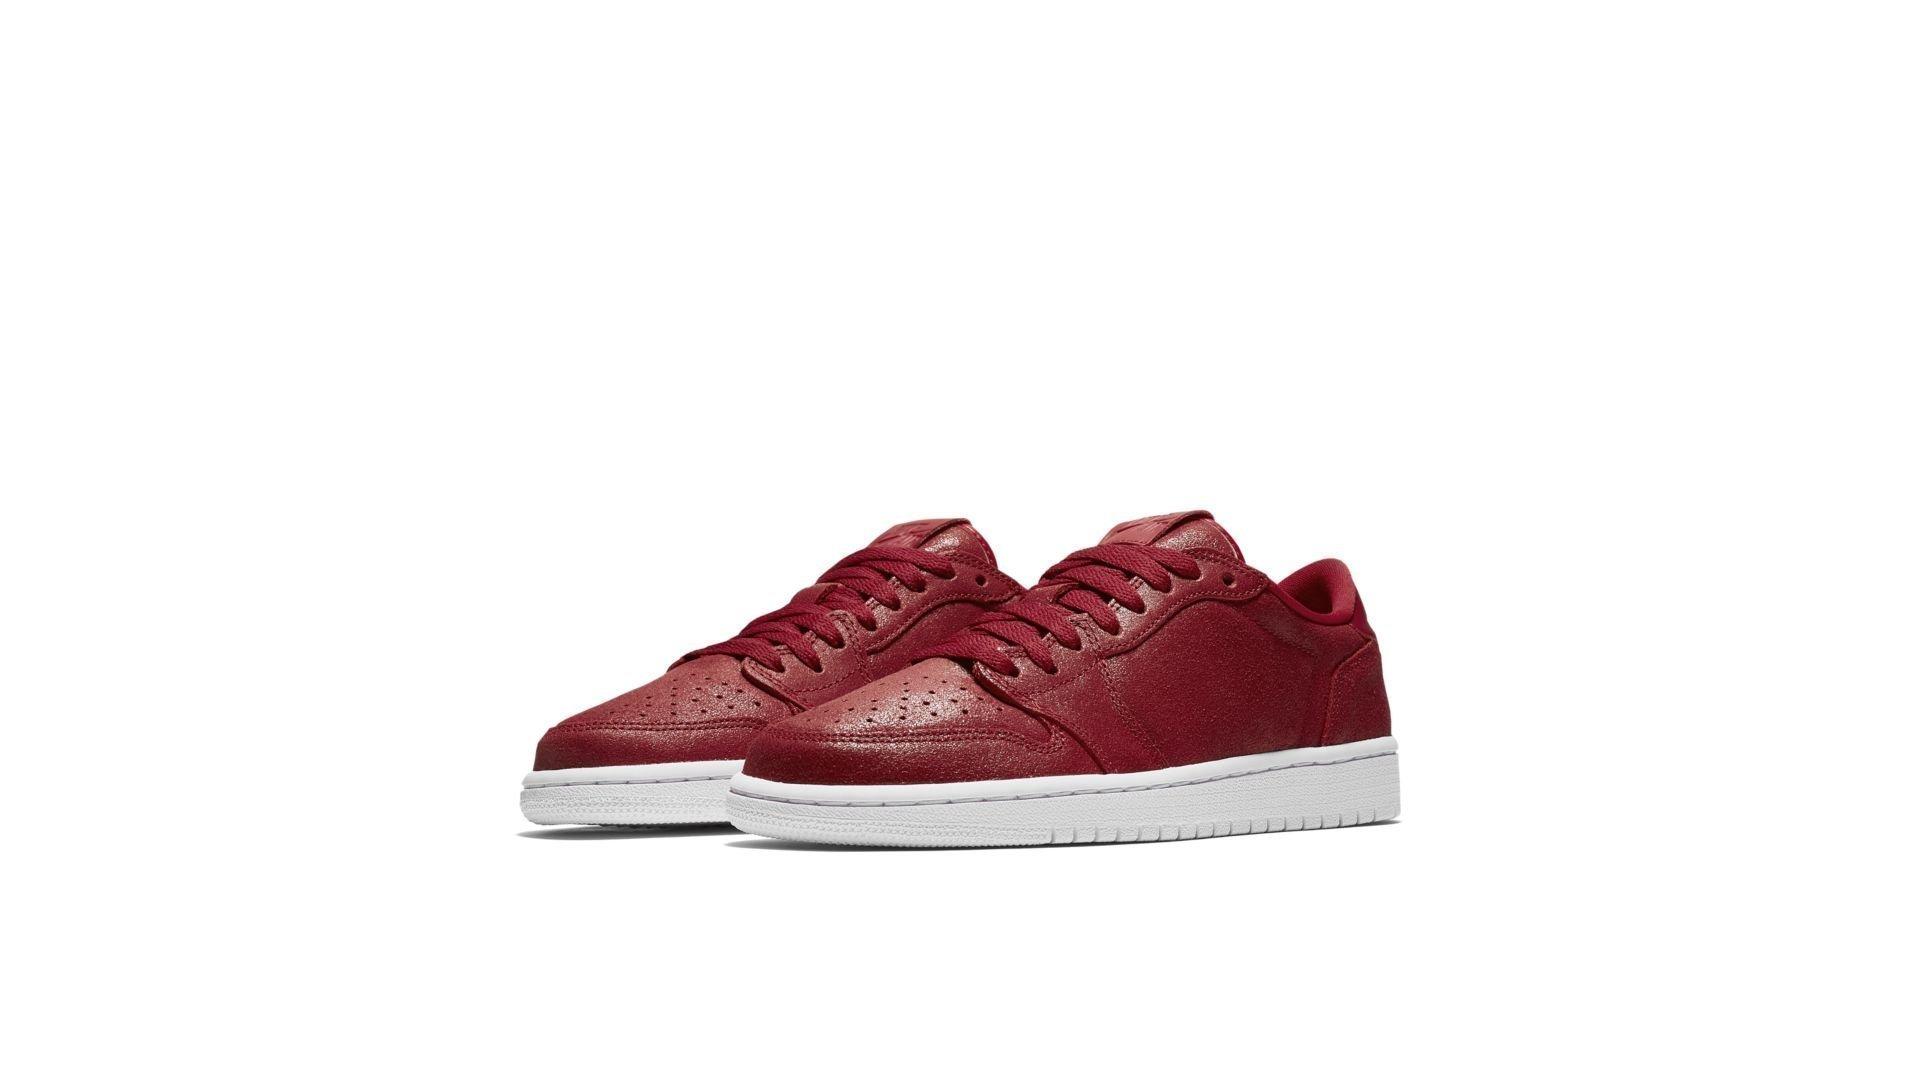 Jordan 1 Retro Low NS Gym Red White (W) (AH7232-623)